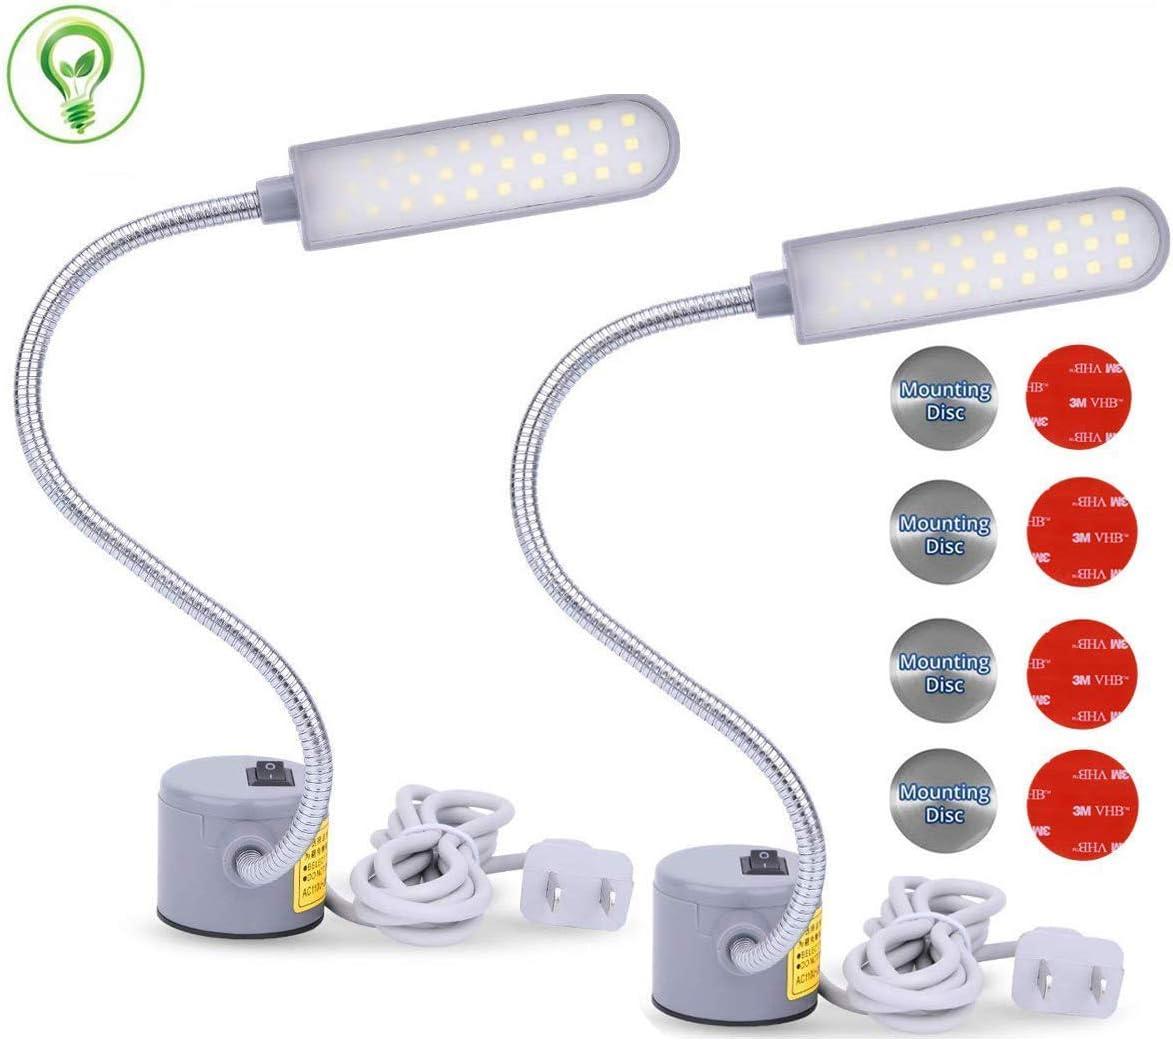 EVISWIY Sewing Machine Light LED Lighting 30LEDs 6 Watt Multifunctional Flexible Gooseneck Arm Work Lamp with Magnetic Mounting Base for Workbench Lathe Drill Press 2 Pack